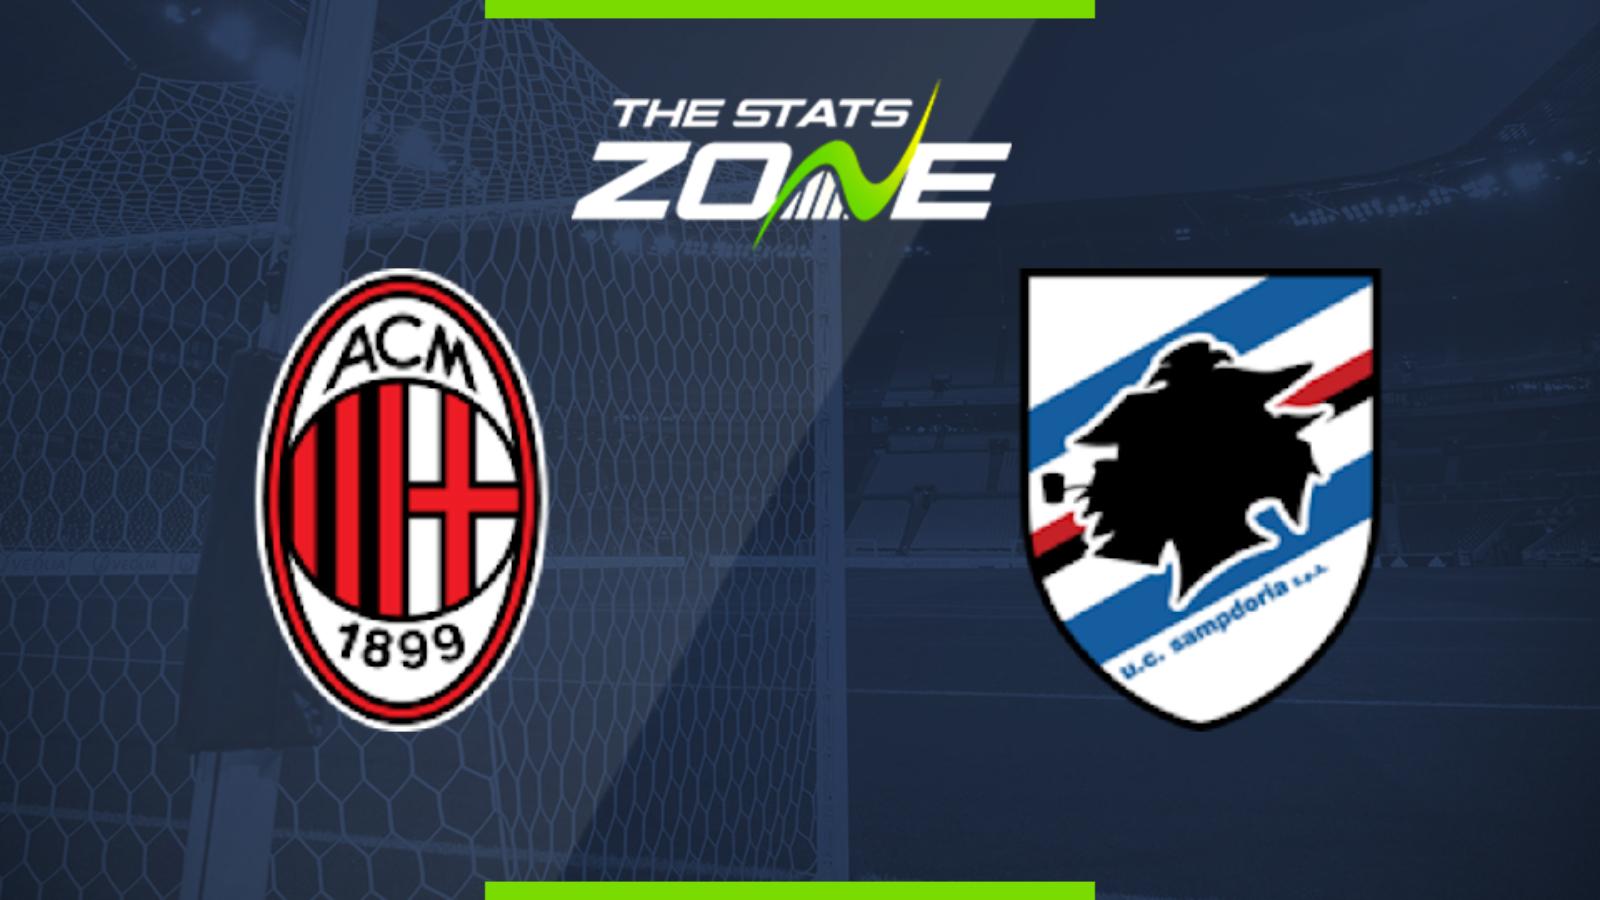 Ac milan vs sampdoria betting tips dagoo sports betting plc software